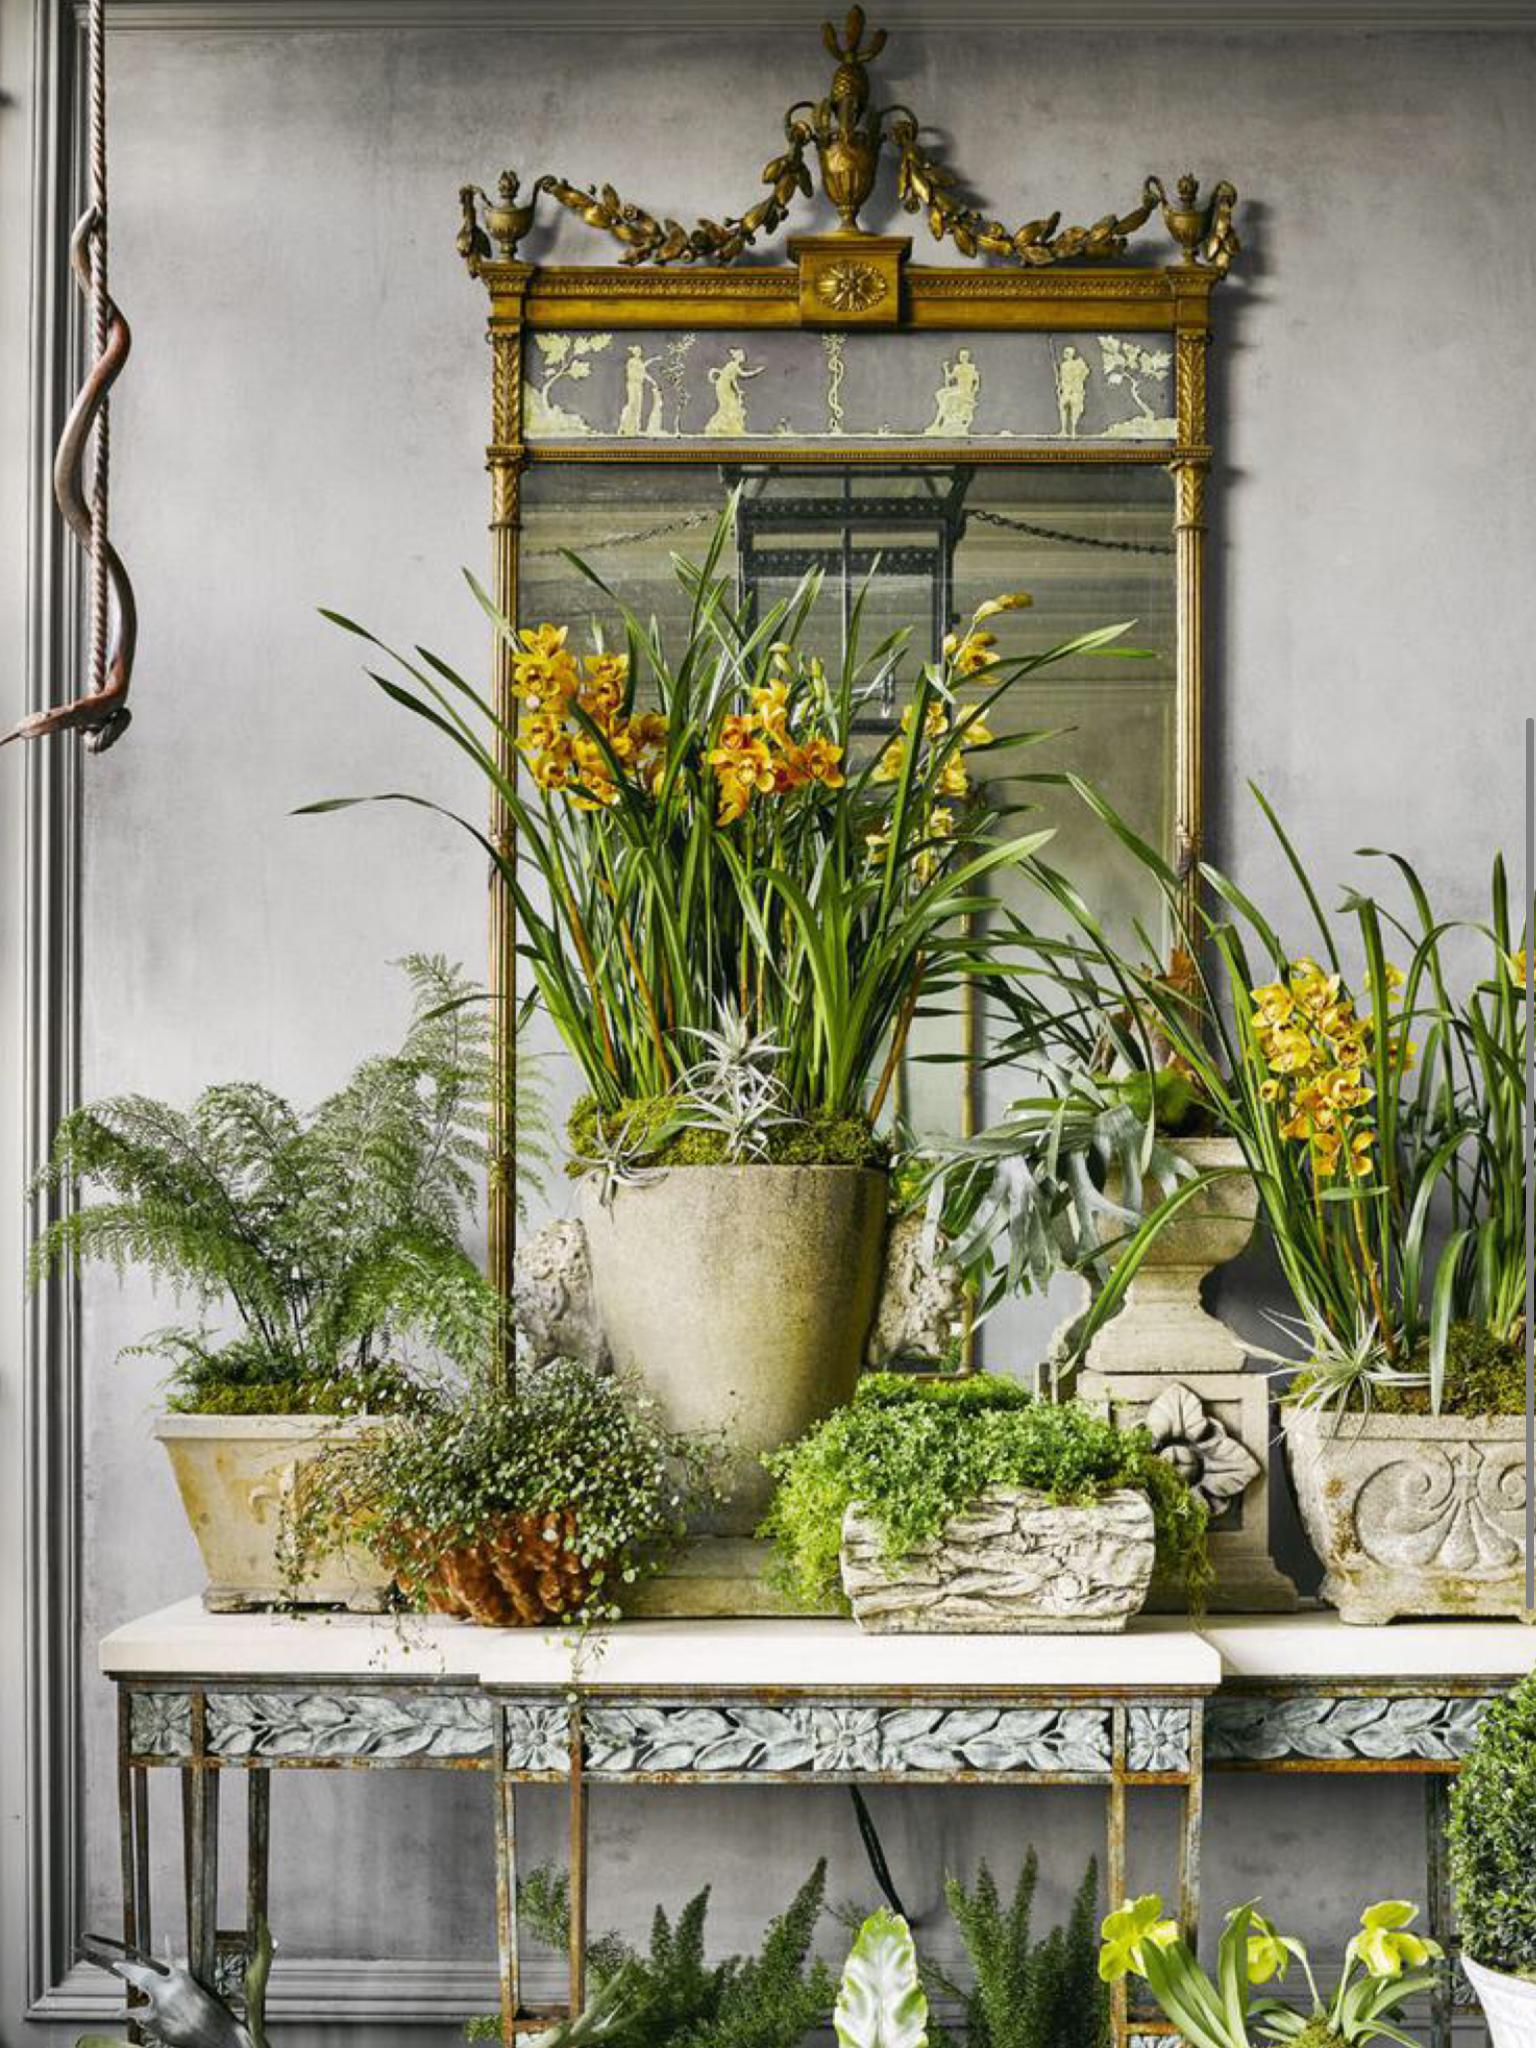 Patios floral shops indoor plants flowers gardening also celebrate decor ideas garden rh pinterest